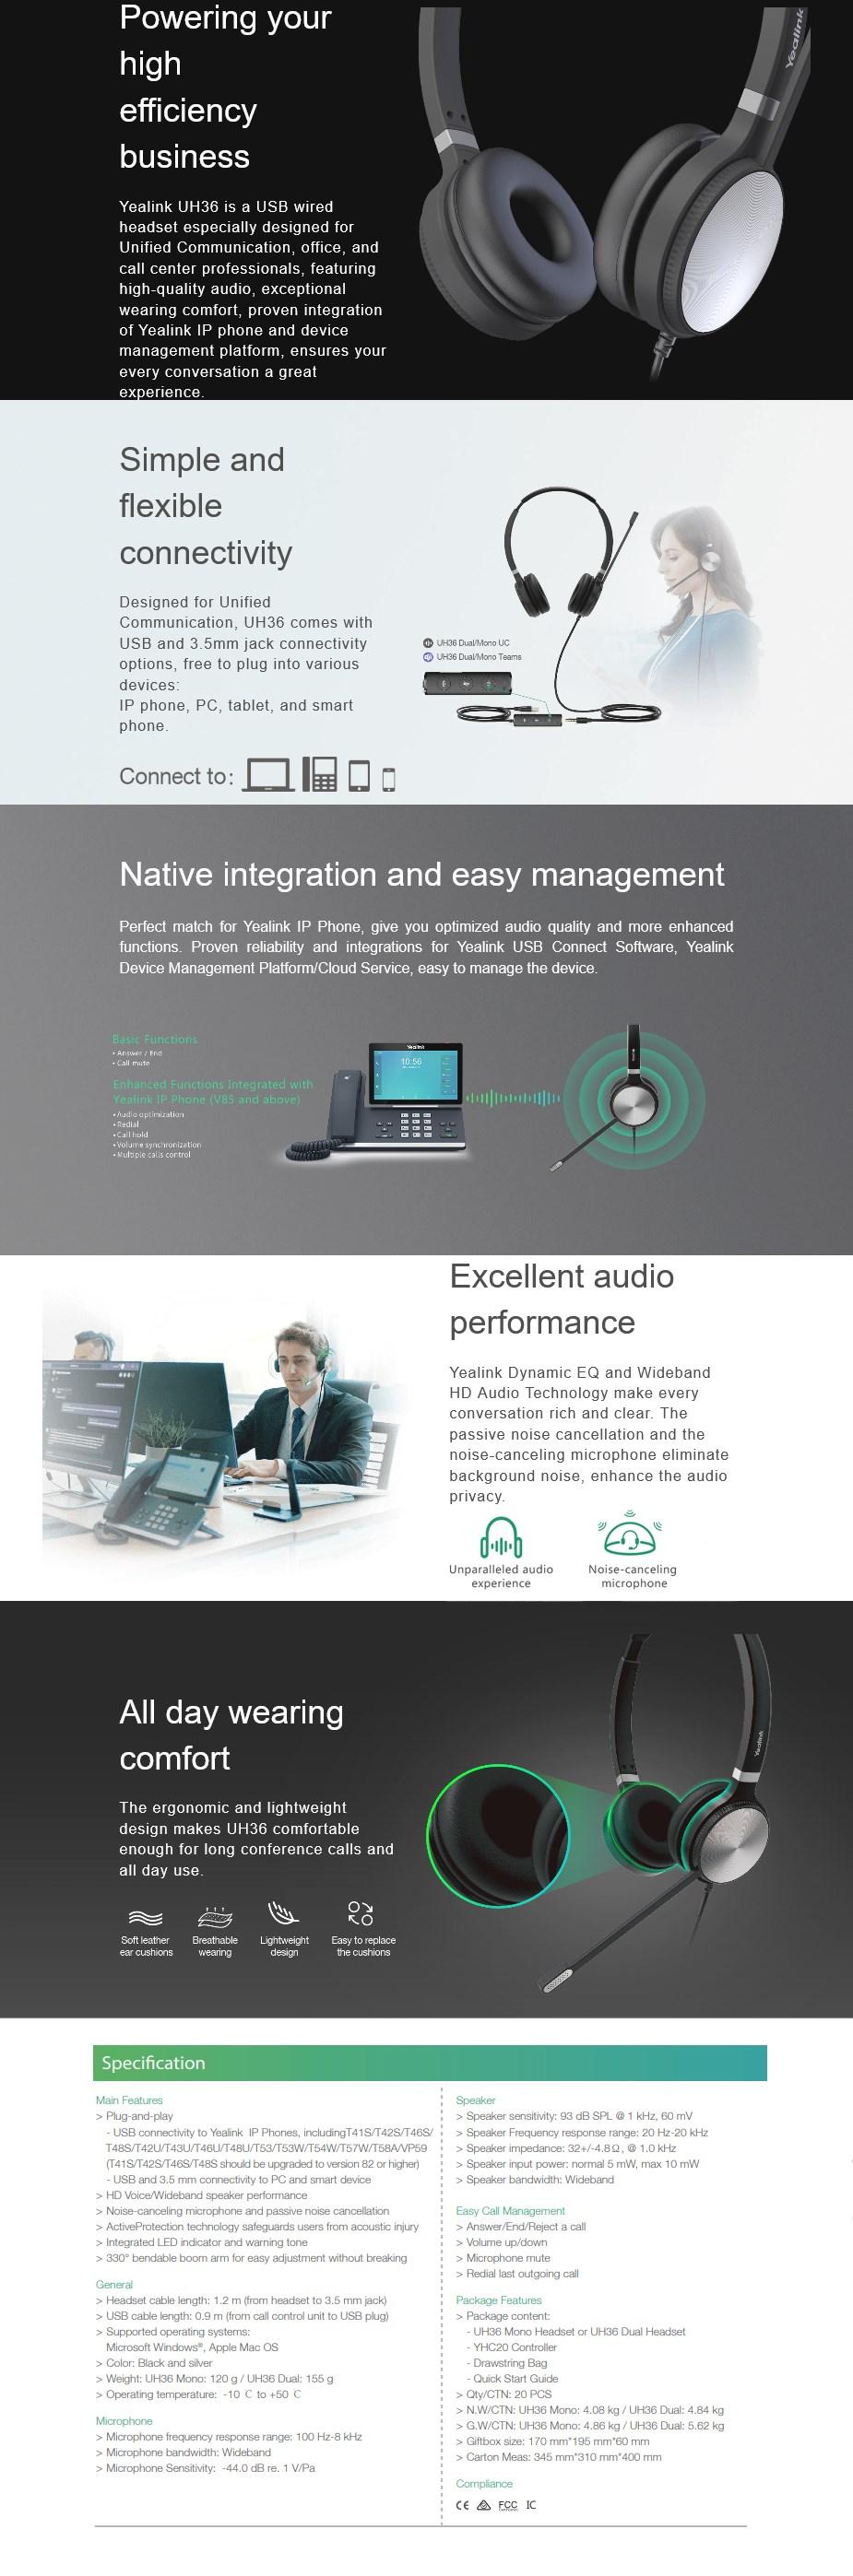 yealink-uh36-duo-stereo-usb-headset-microsoft-teams-ac35488-1.jpg